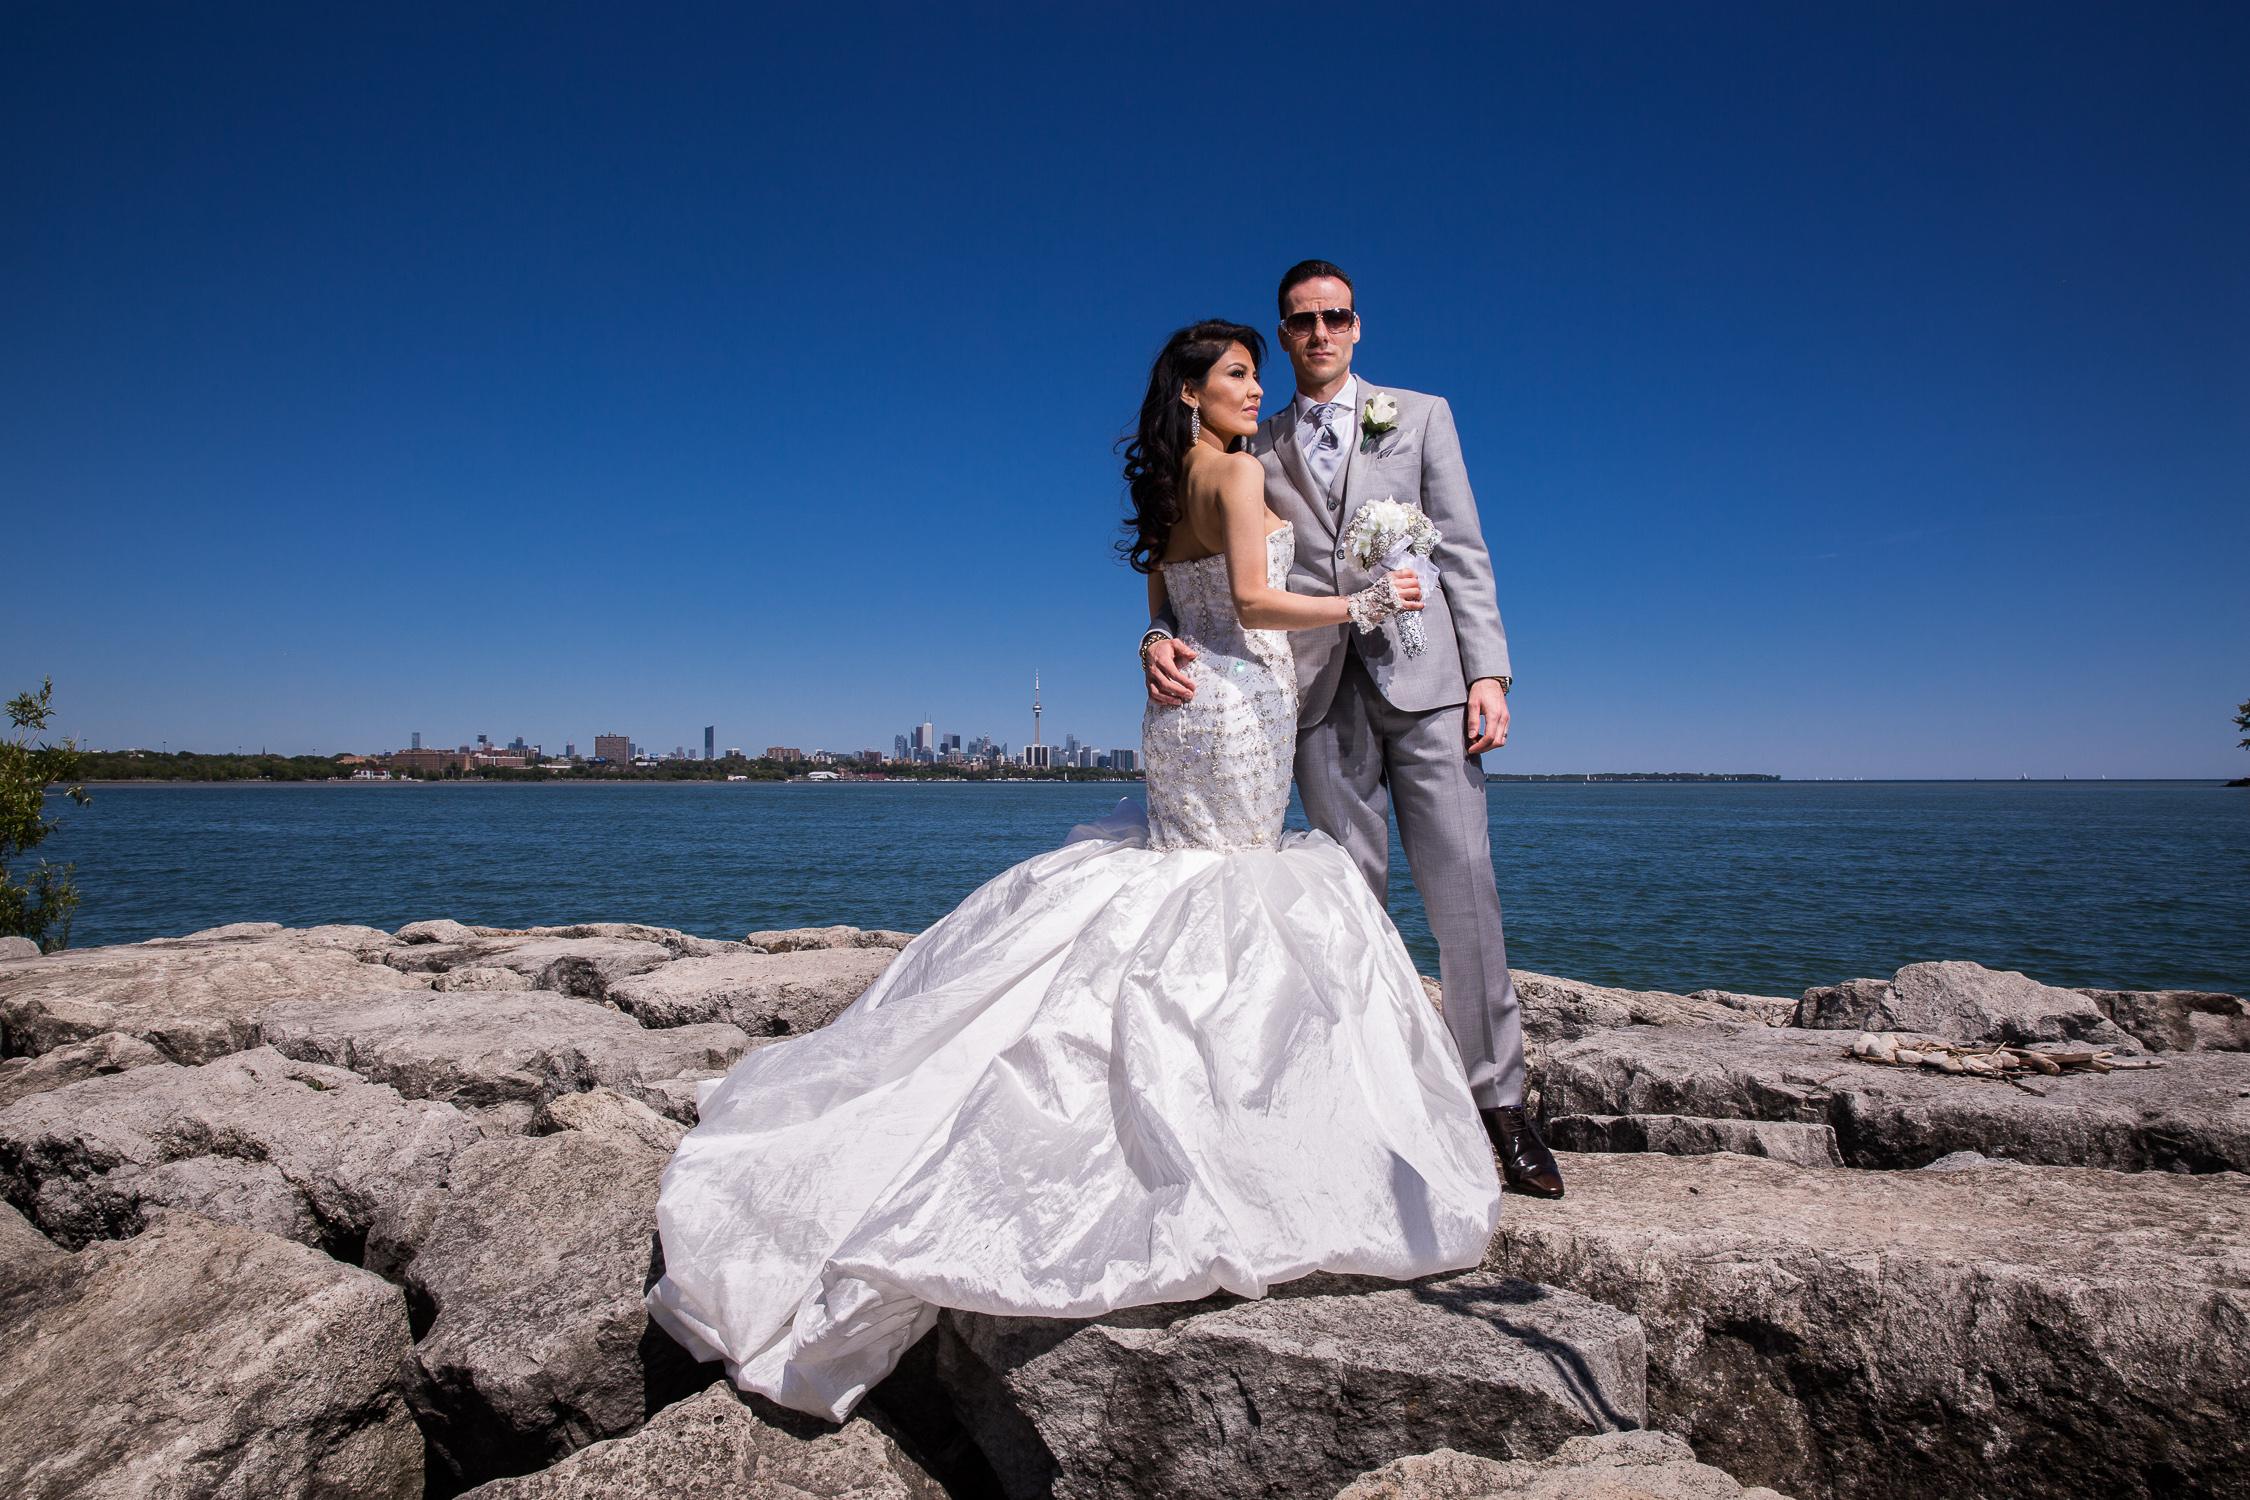 Paradise-Banquet-Hall-Wedding-Vaughan-Ontario-0055.jpg